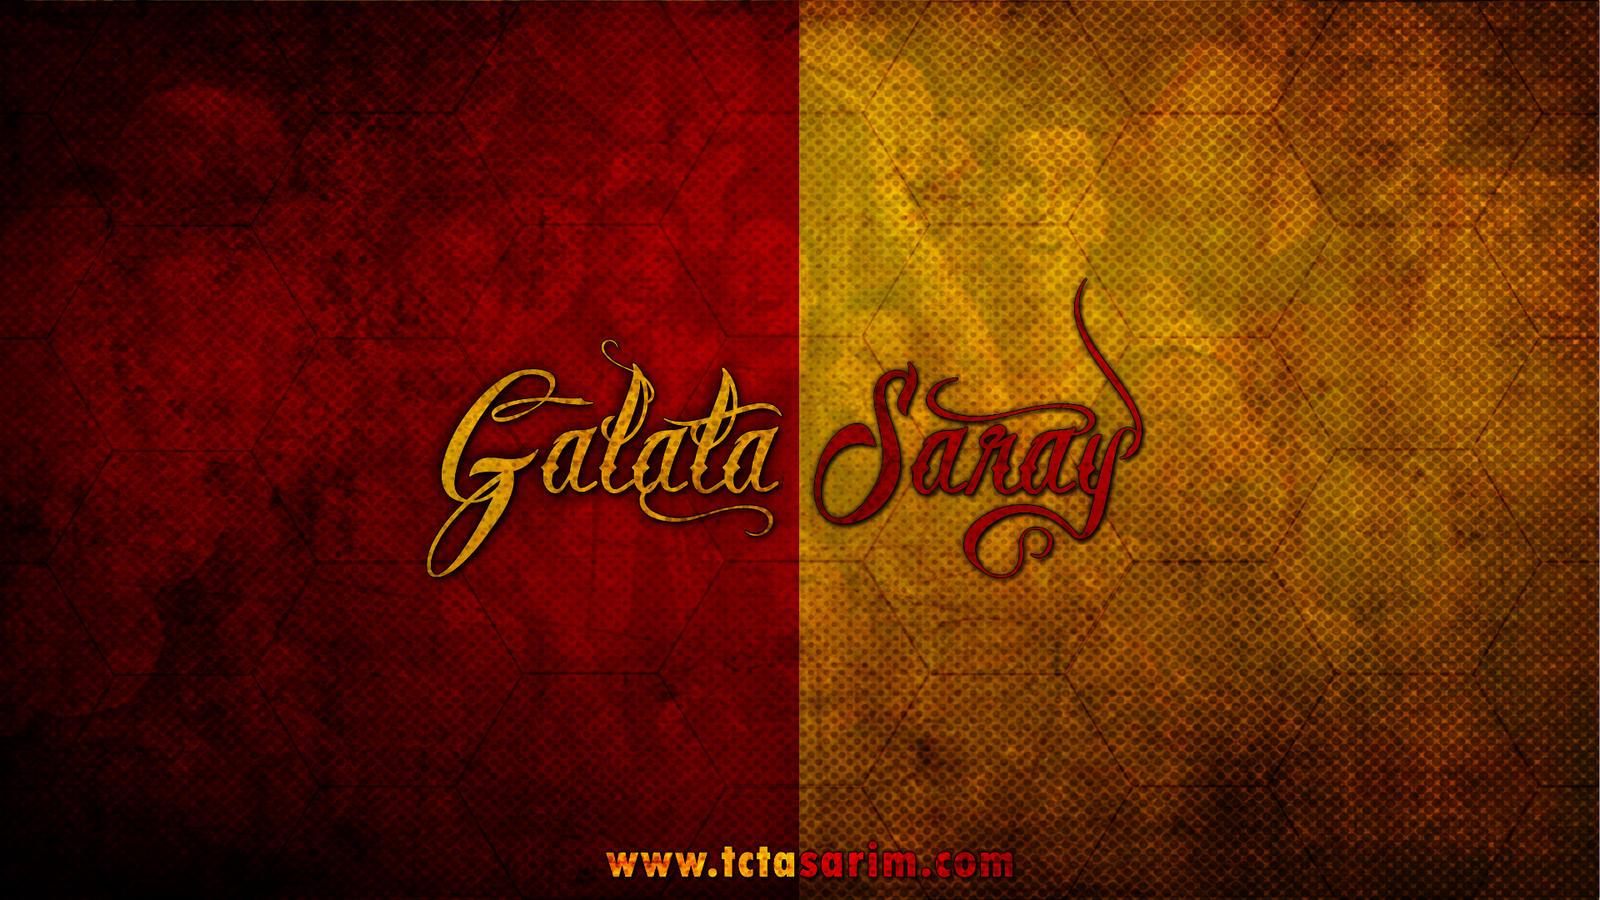 Galatasaray Wallpaper by tctasarim on DeviantArt